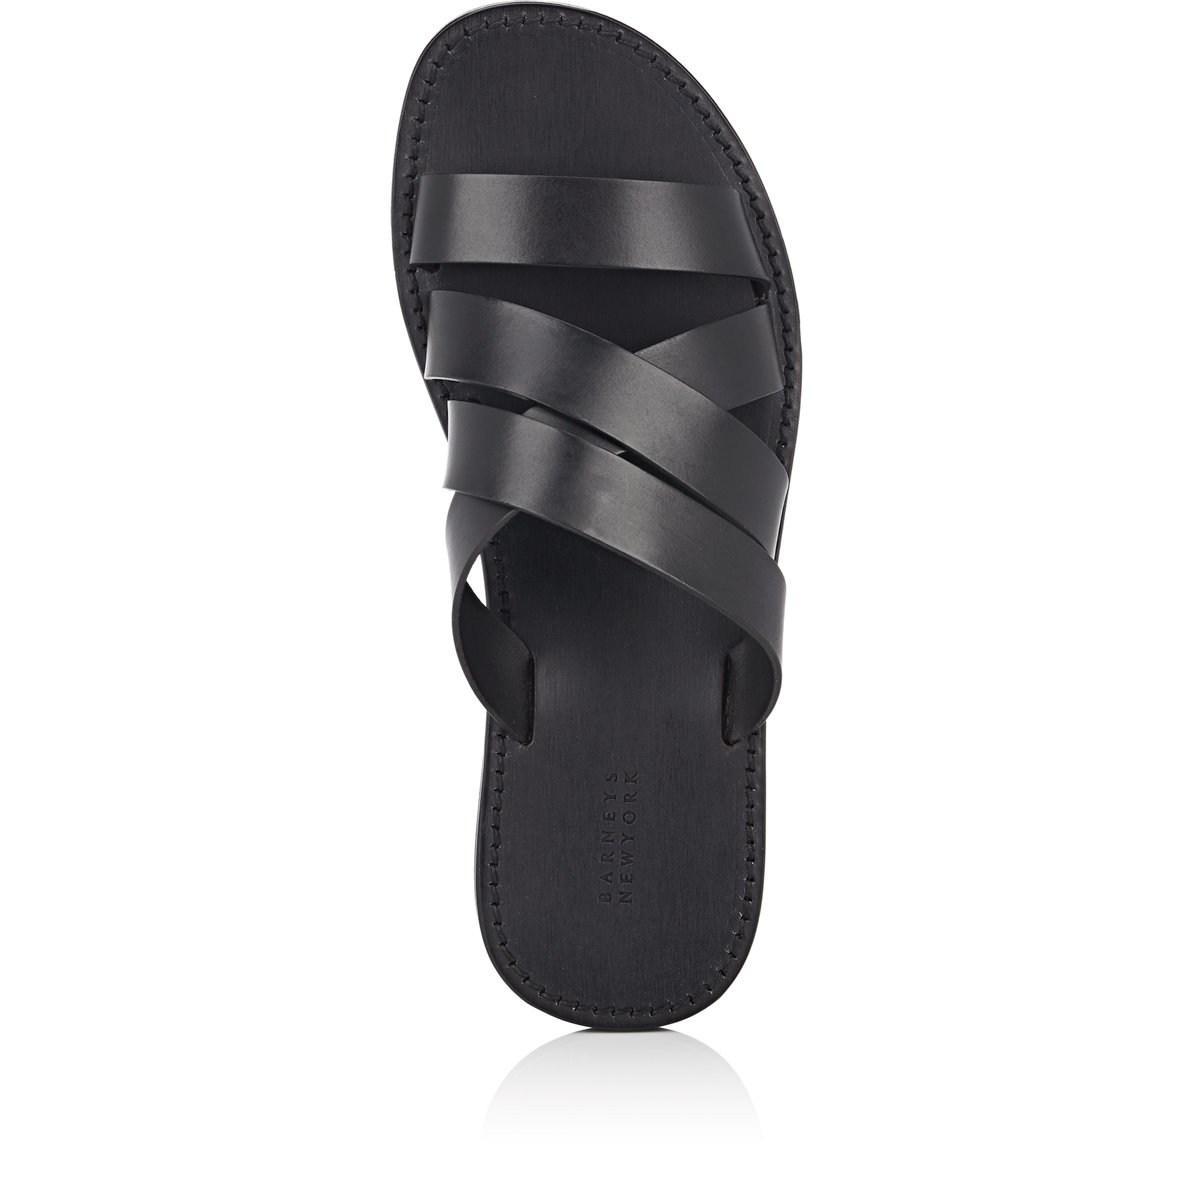 c83126a54 Lyst - Barneys New York Leather Slide Sandals in Black for Men